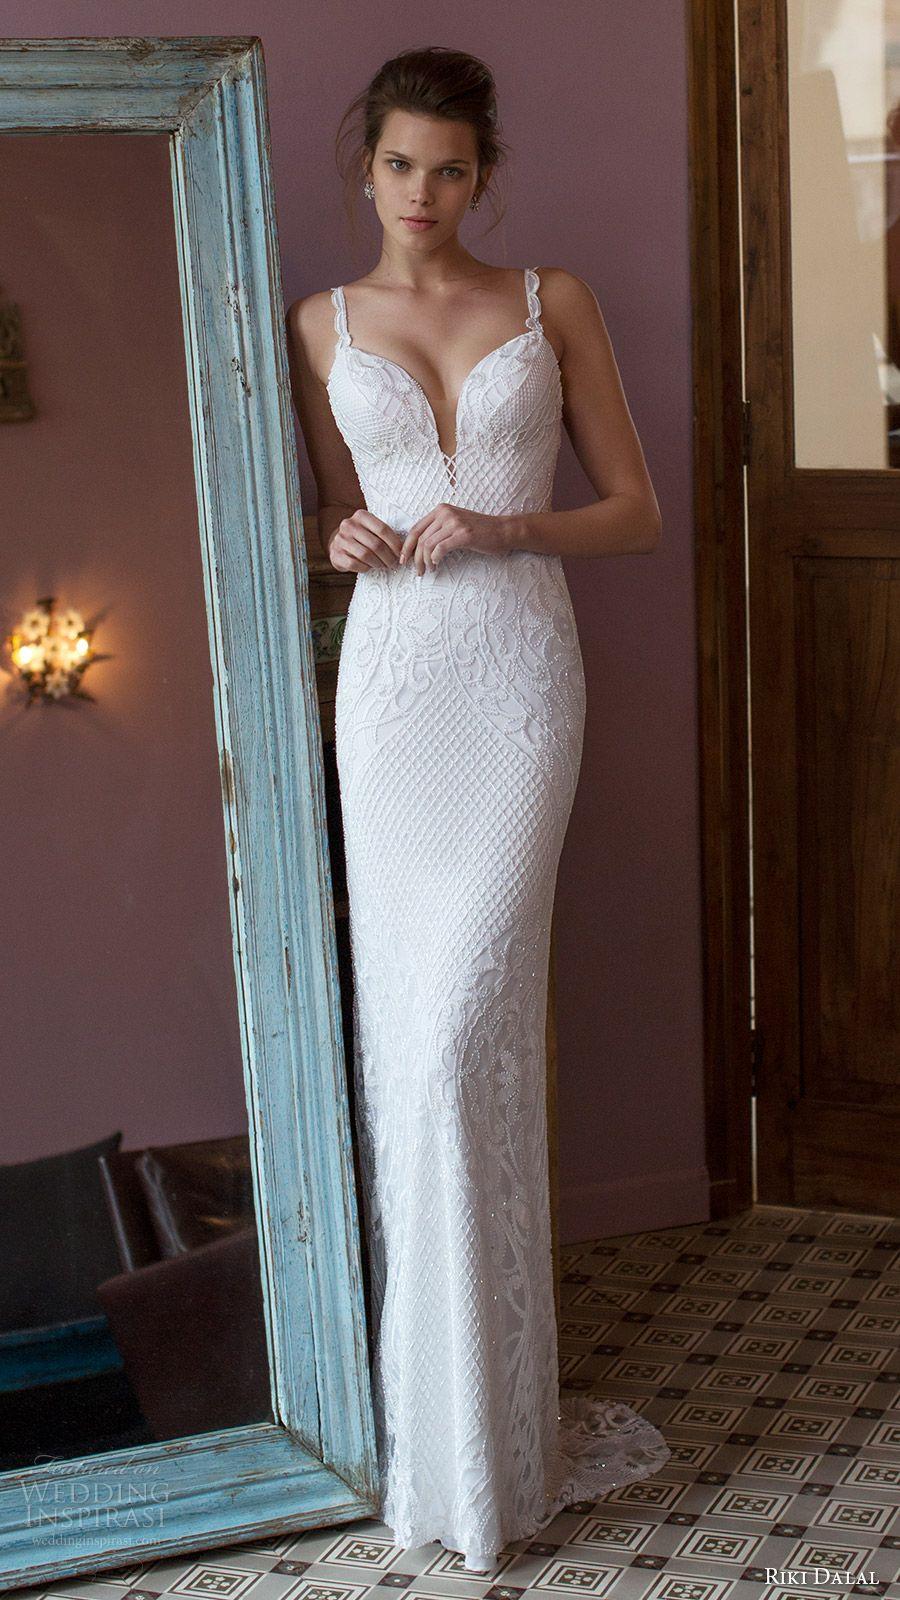 Beaded sheath wedding dress  Riki Dalal  Wedding Dresses u ucVeronaud Bridal Collection